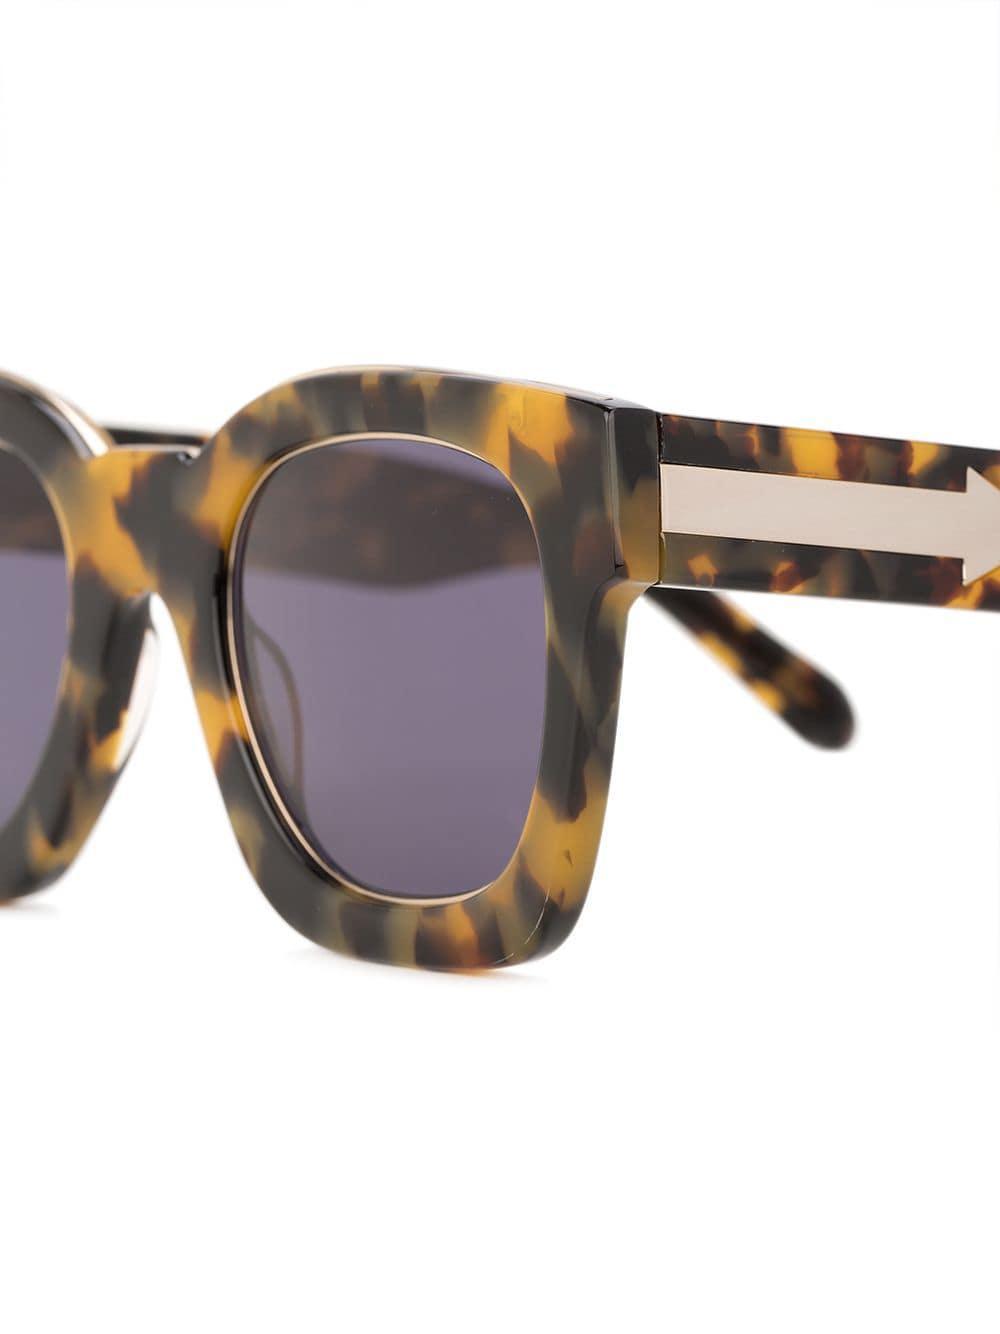 ae1c552c437 Karen Walker Pablo Sunglasses in Gray - Lyst